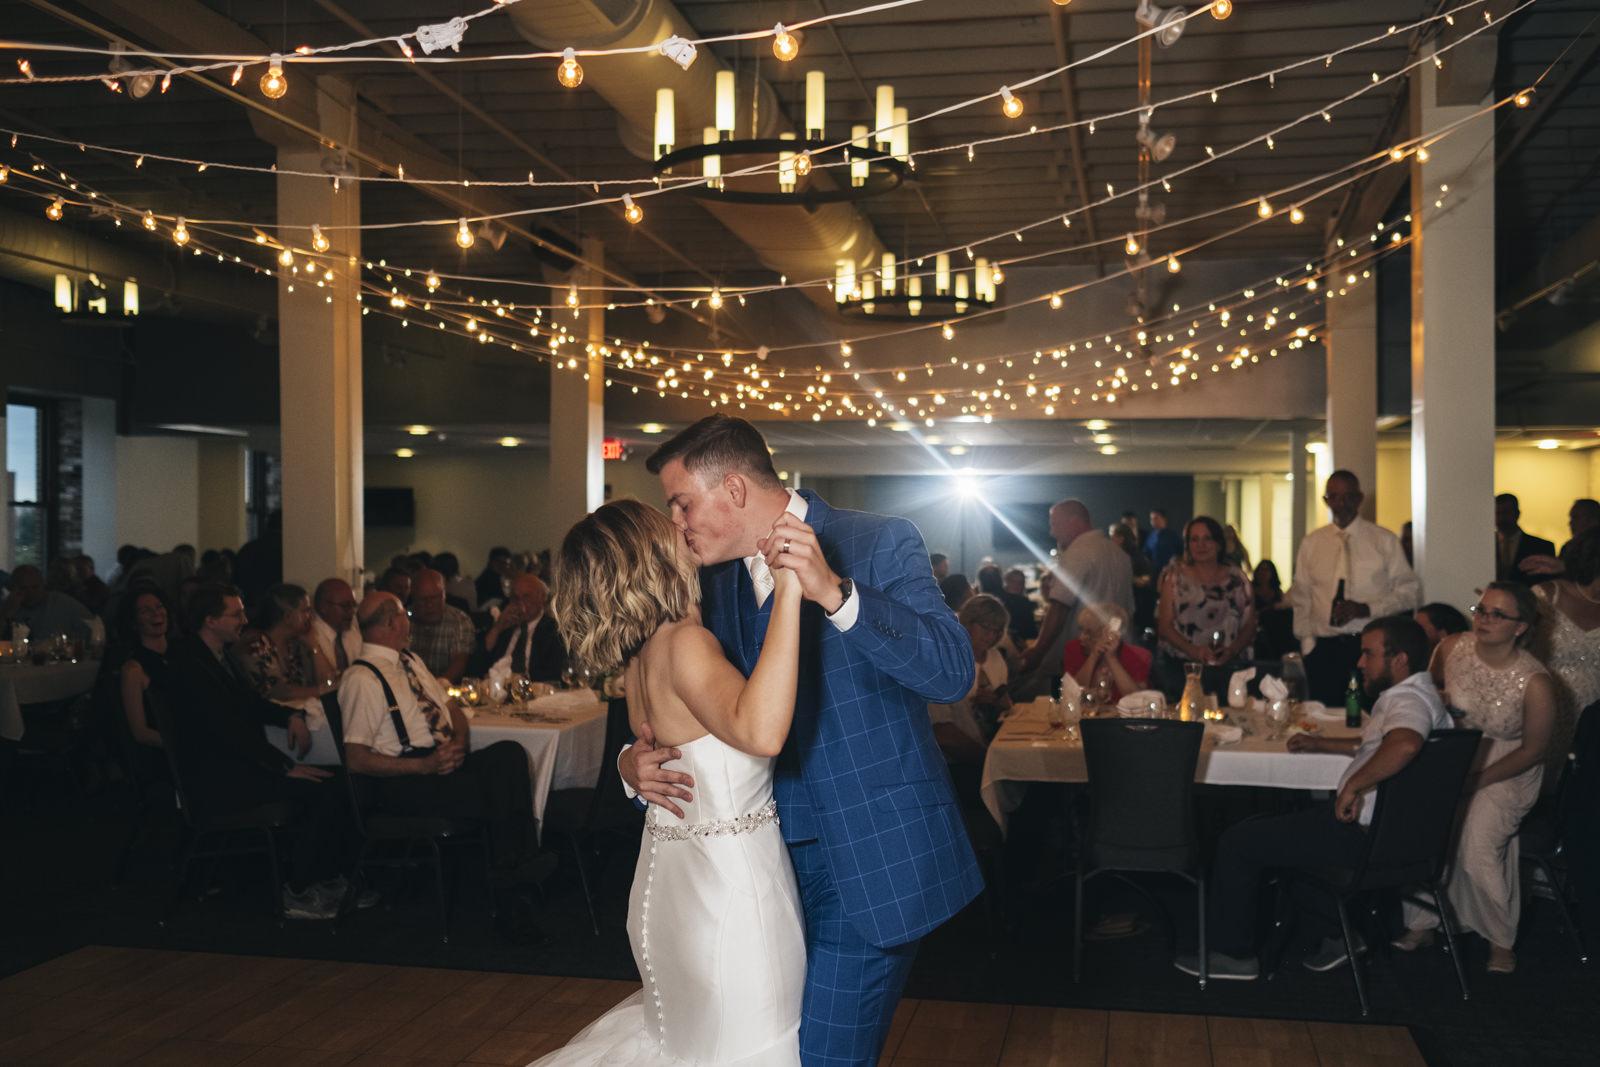 Bride and groom dance under string lights at their Hensville wedding reception.